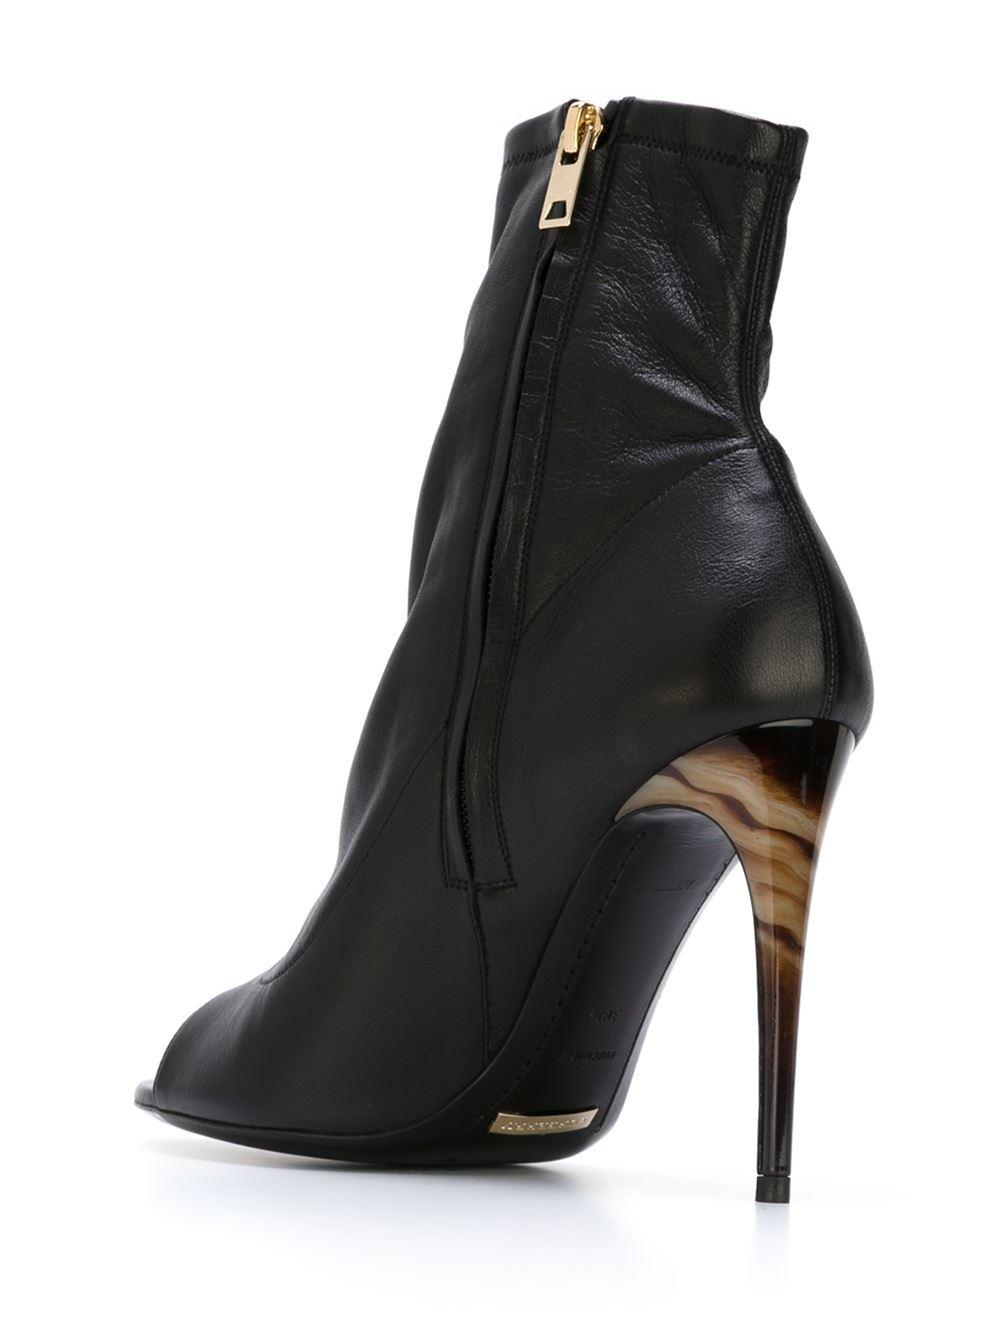 Burberry Prorsum Peep Toe Booties In Black Lyst